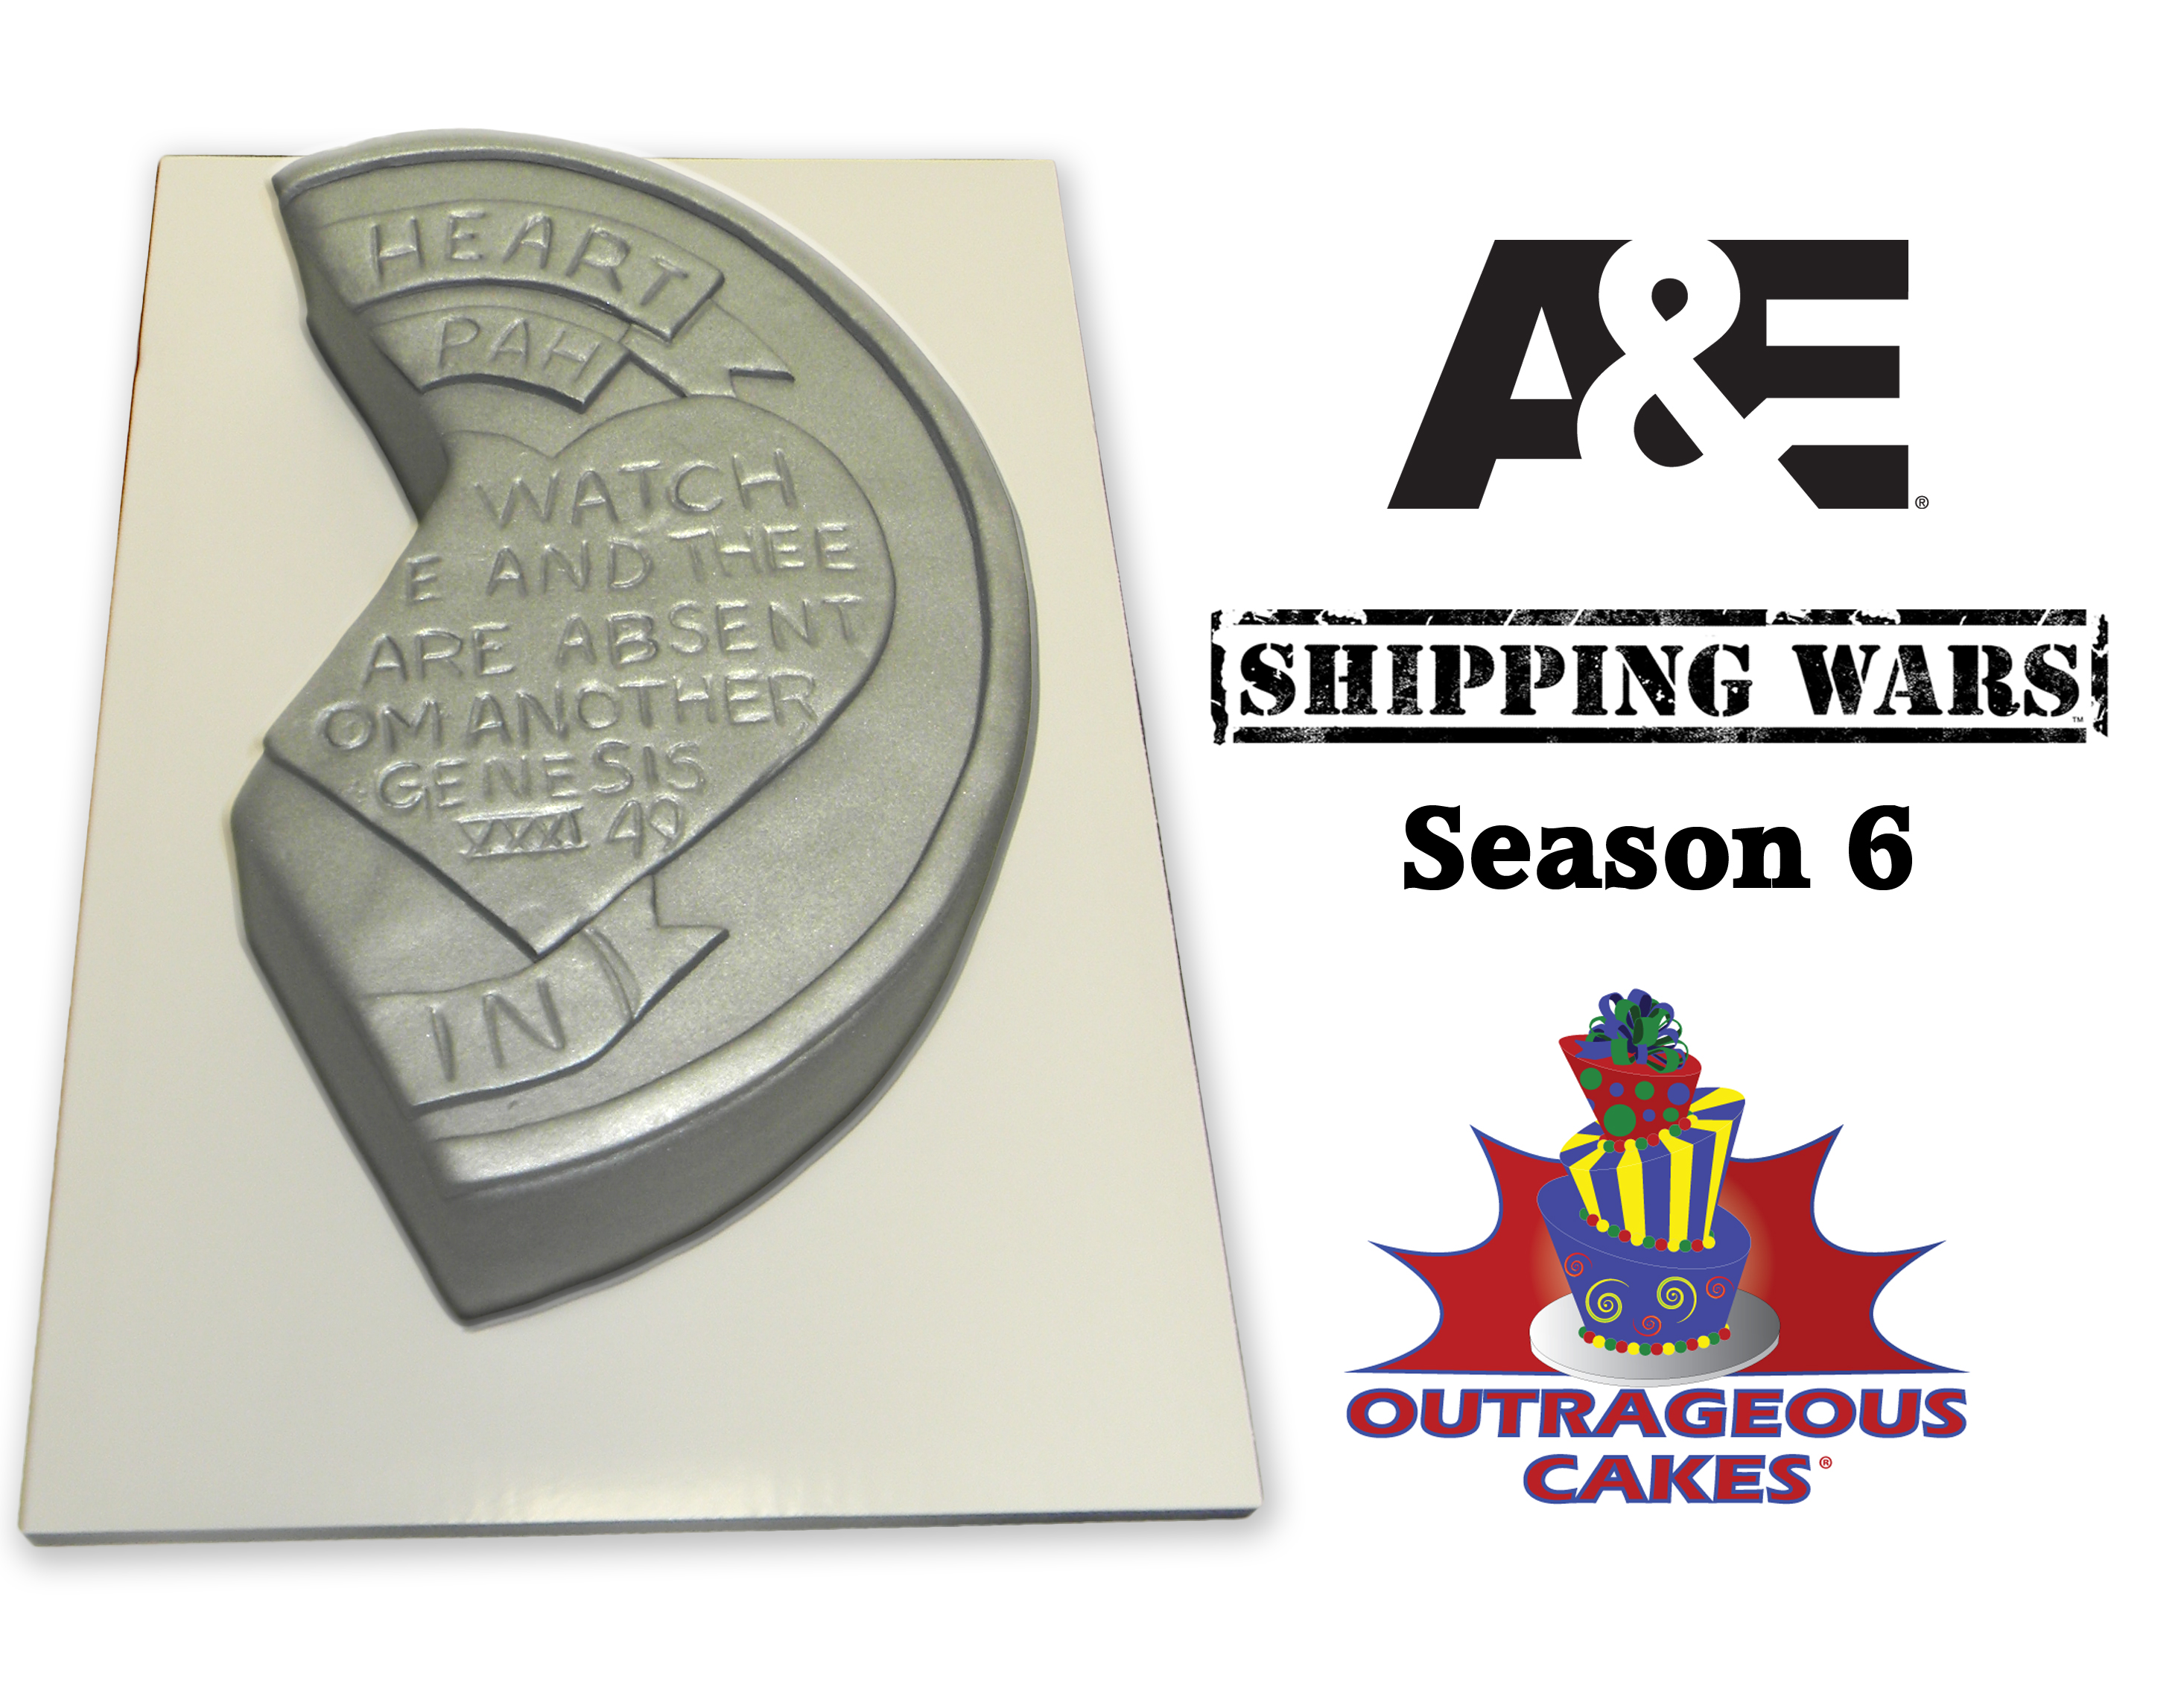 A & E Shipping Wars Cake